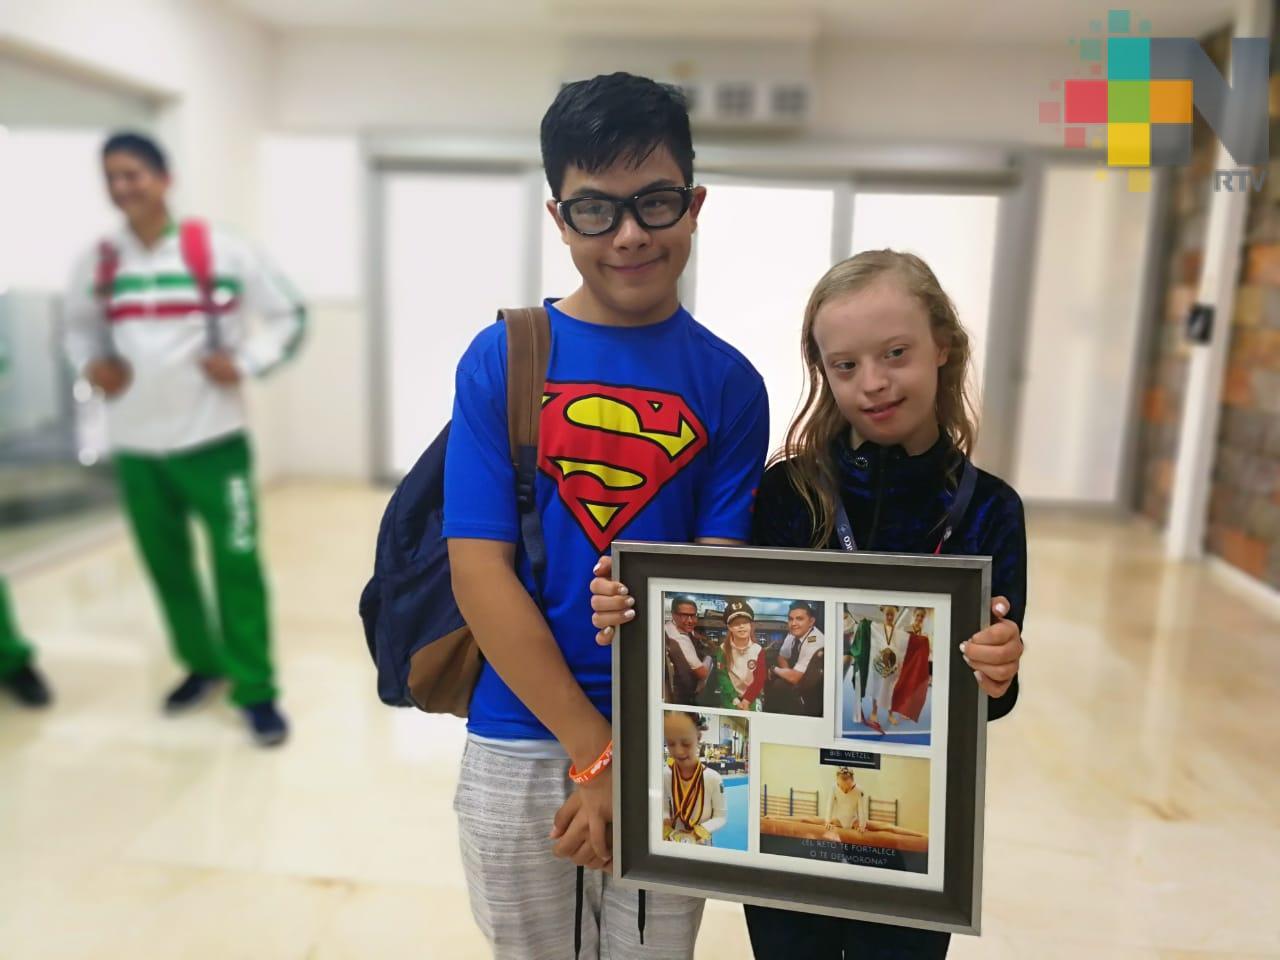 Con ocho medallas de oro, gimnastas con síndrome de Down regresan a Coatzacoalcos